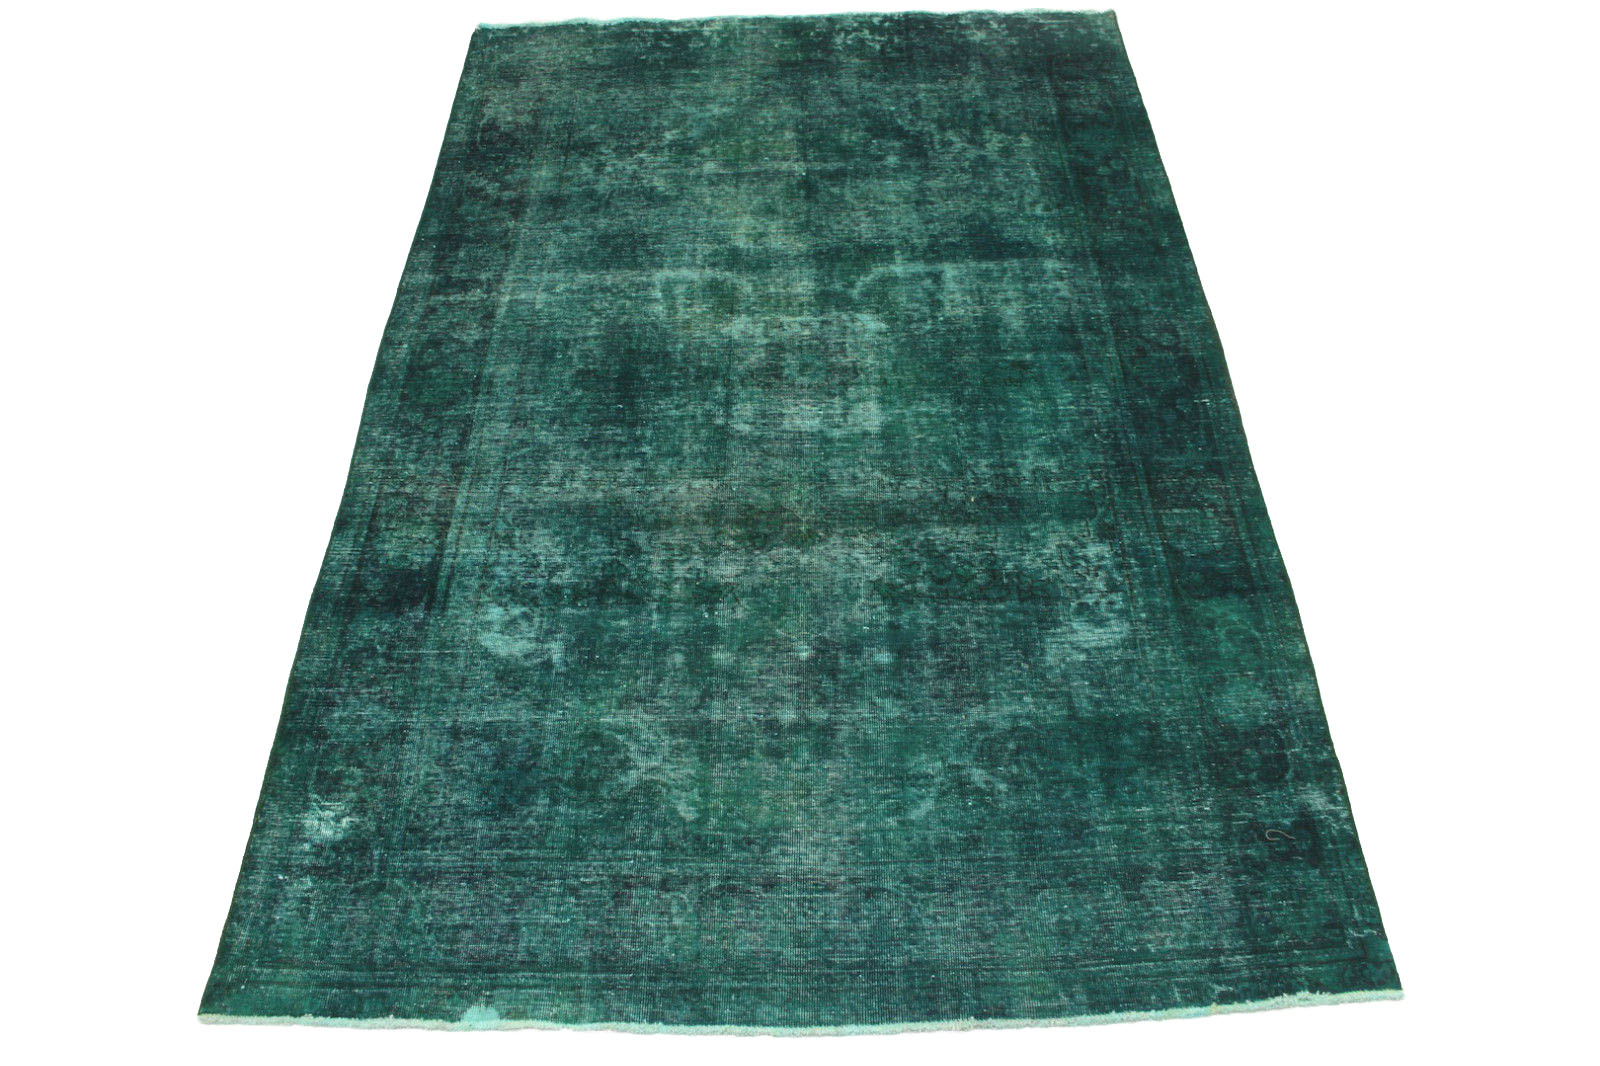 vintage teppich gr n t rkis in 310x200cm 1001 2731 bei kaufen. Black Bedroom Furniture Sets. Home Design Ideas